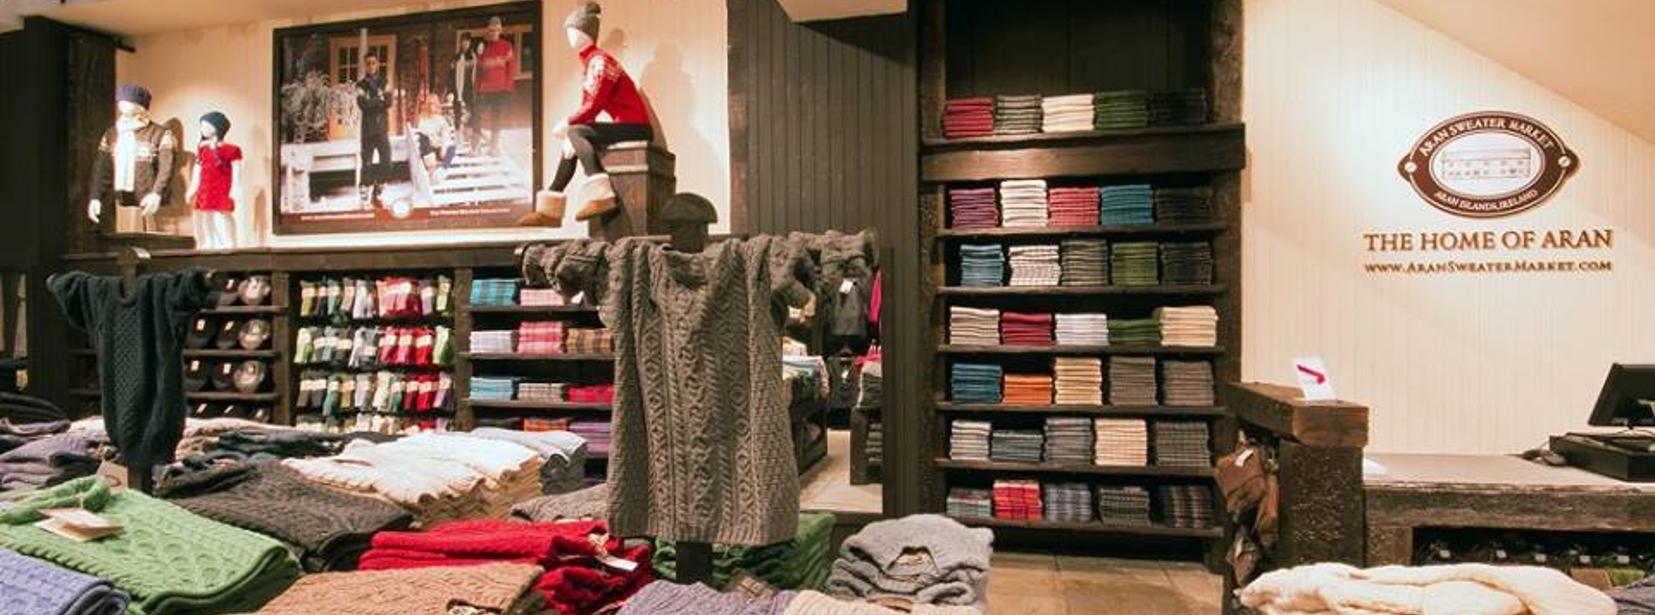 Aran Sweater Market Dublin Mycityhighlight